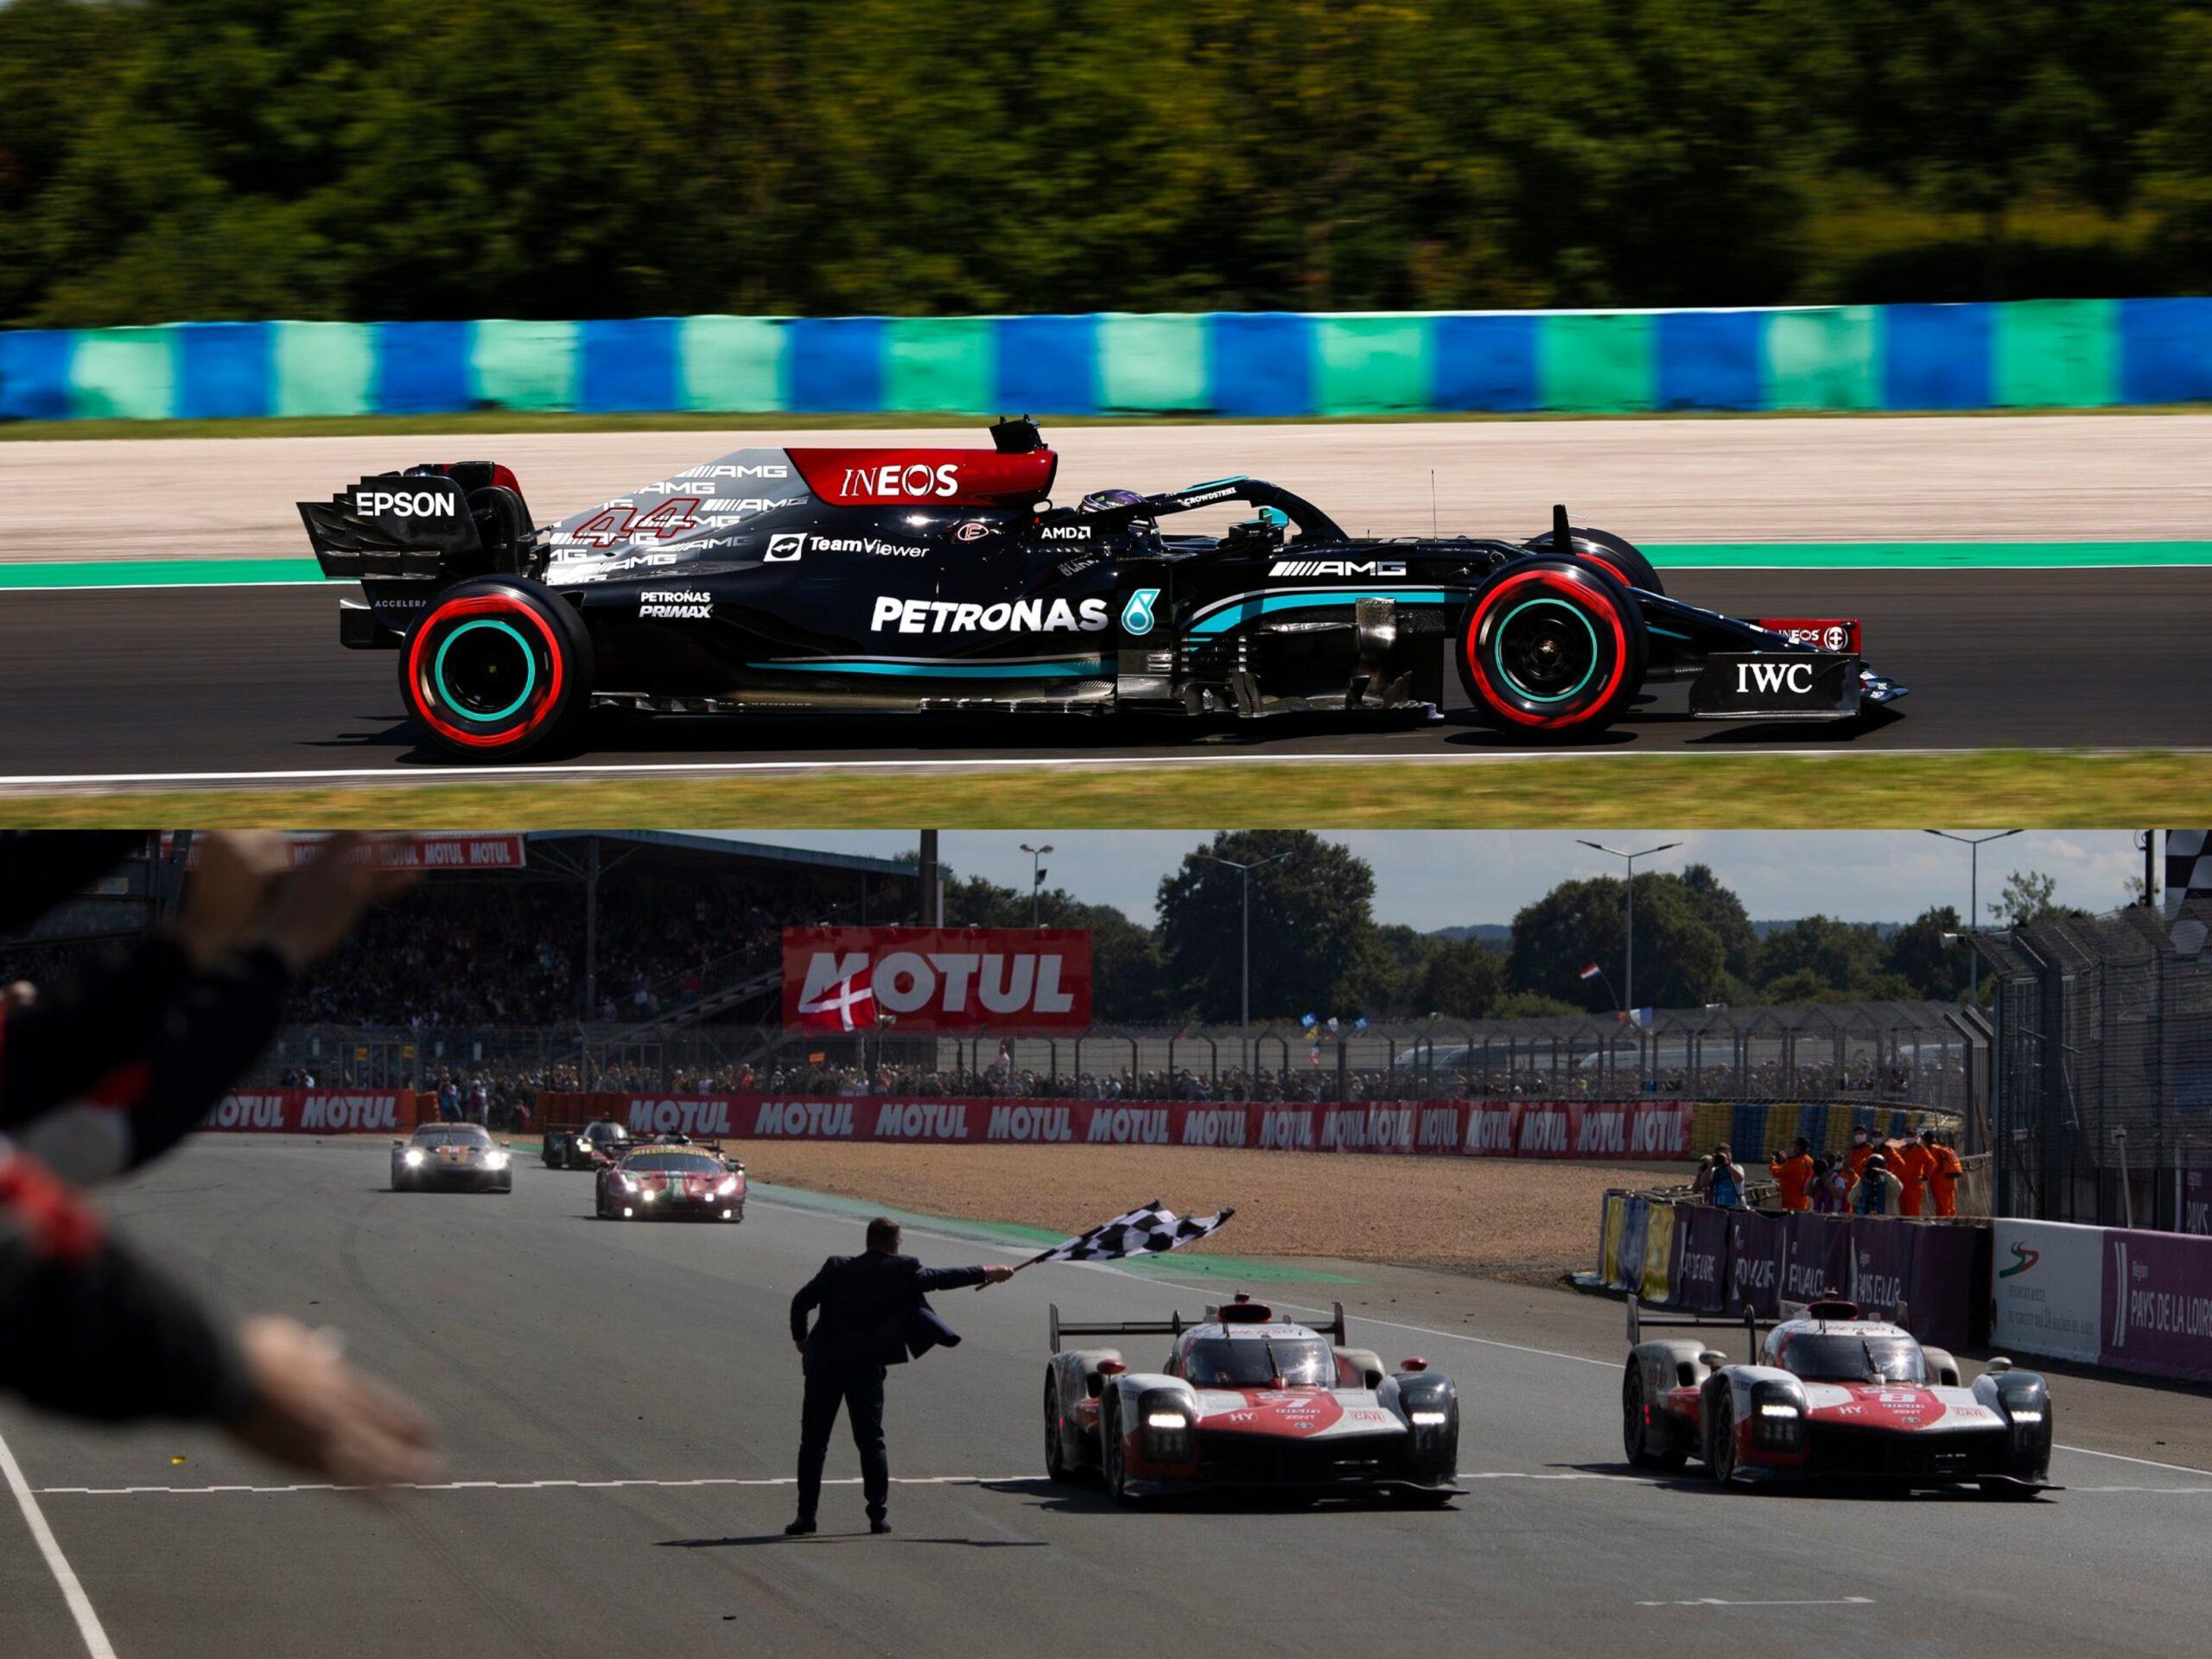 Formula 1 vs Le Mans Hypercar. Chi vince?